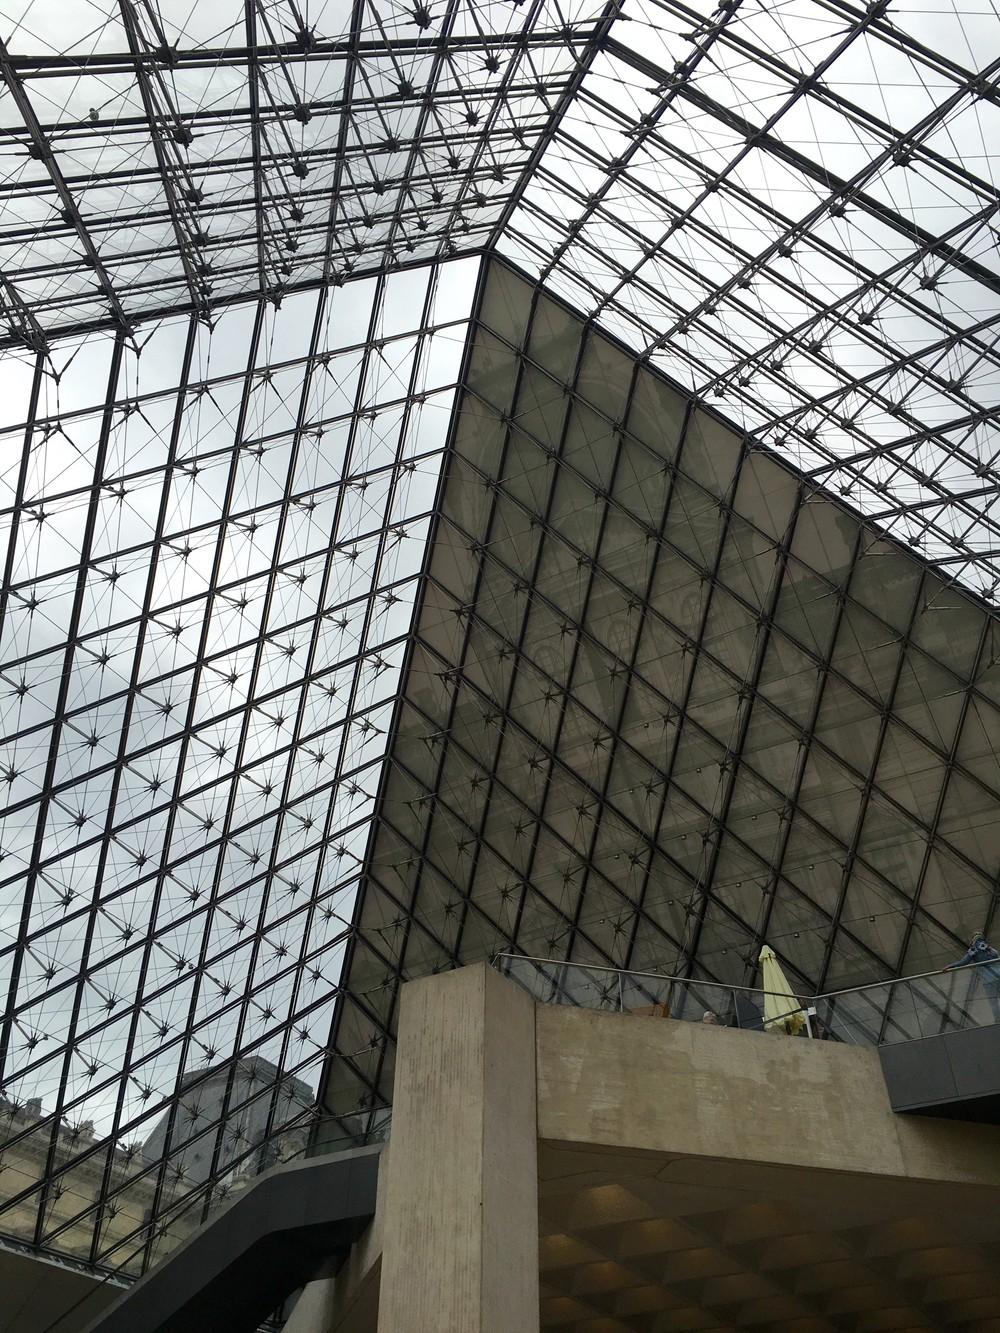 jr-artiste-contemporain-art-photo-restaurarte-galerie-perrotin-paris-le-havre-decade-louvre-restauration-pyramide-pei.jpg